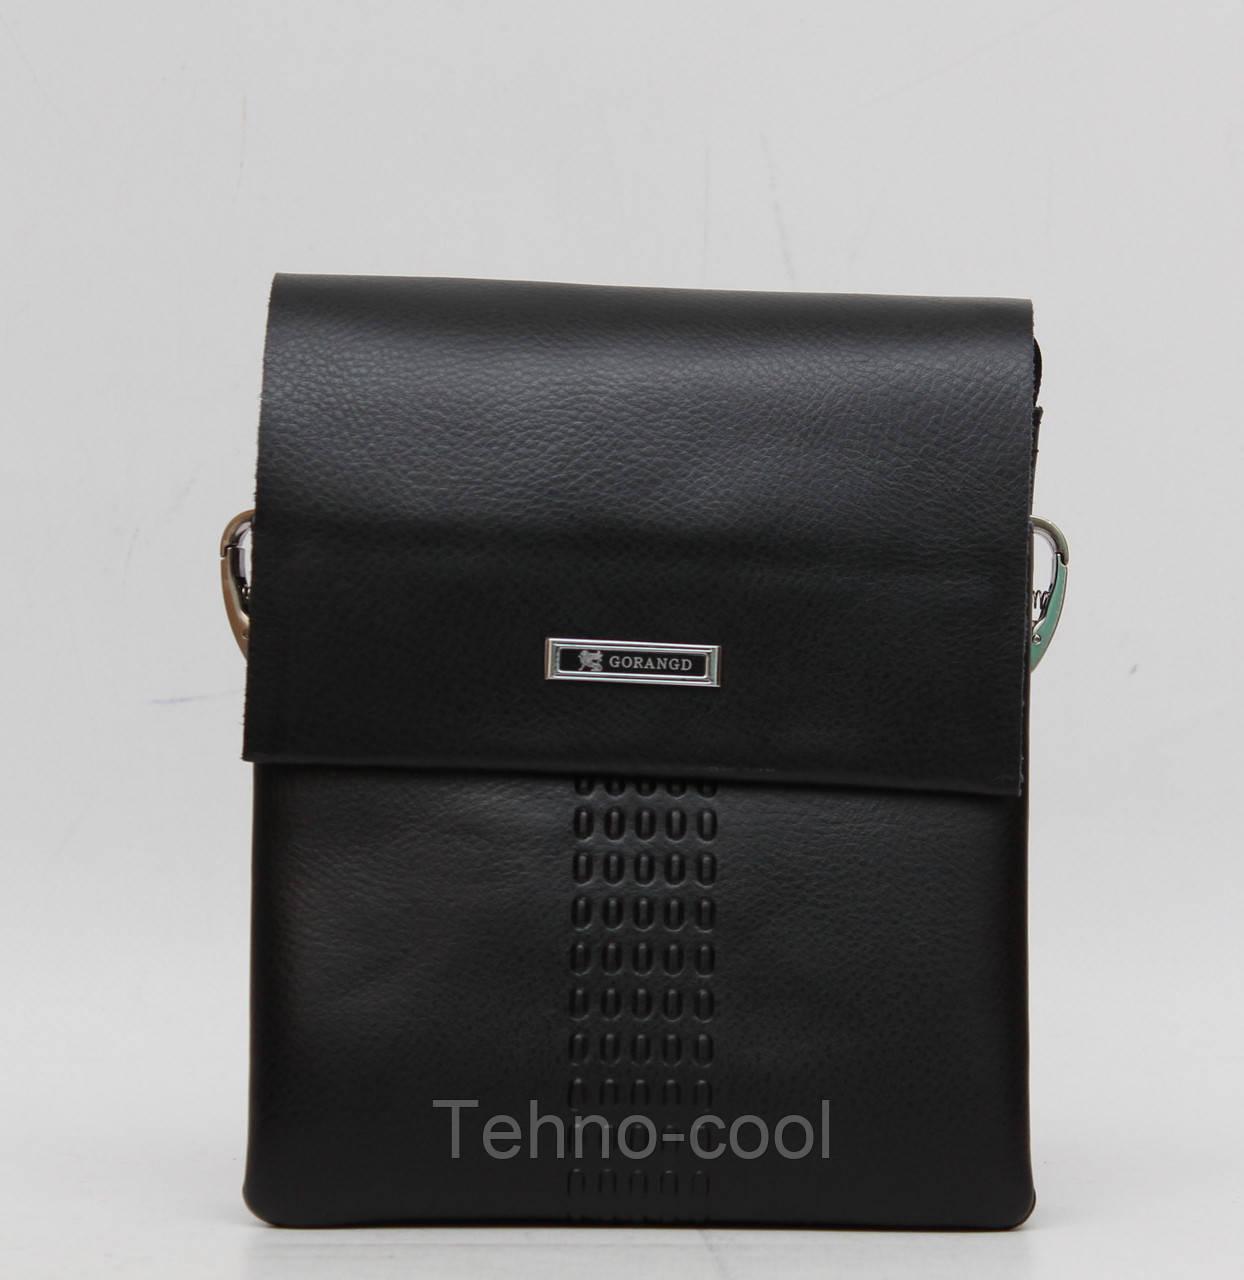 Стильная мужская сумка через плечо Gorangd  продажа, цена в Харькове ... 0ae9b7692b2